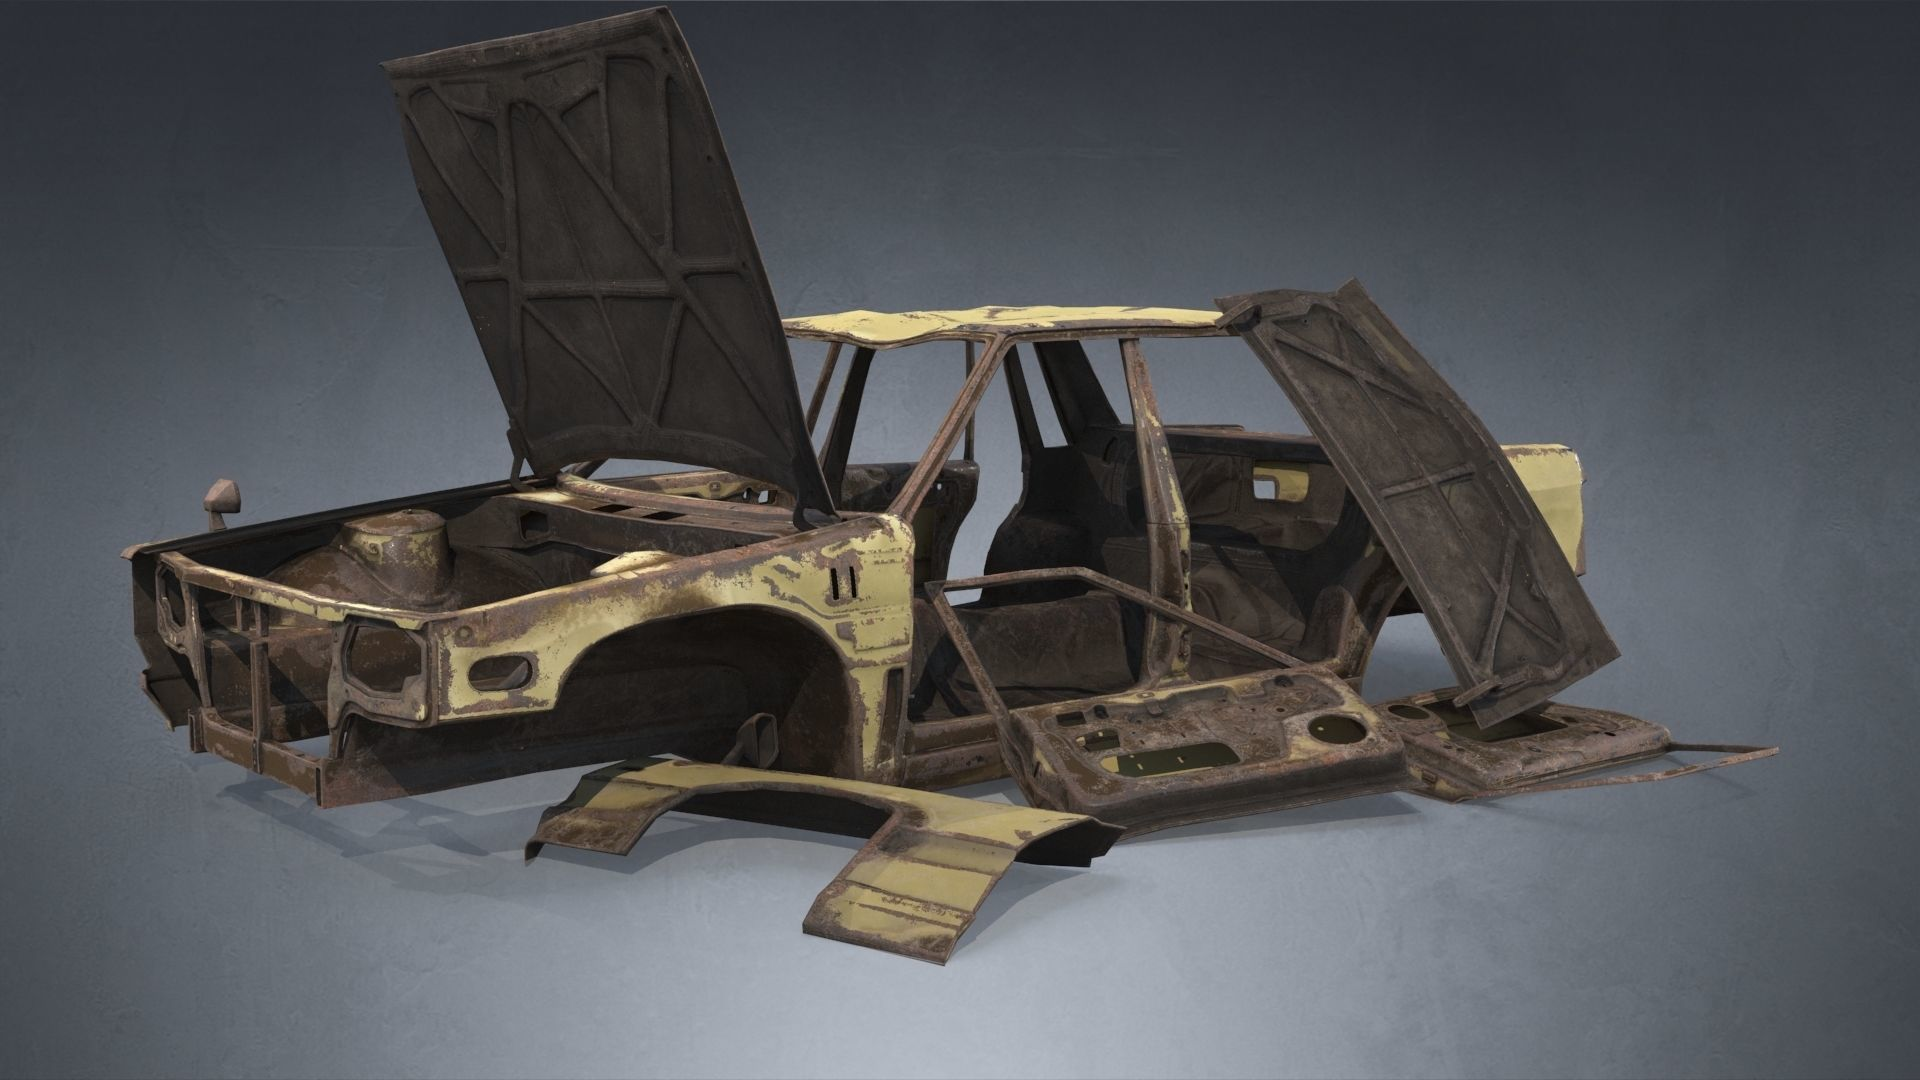 Abandoned Rusty Wrecked Sedan